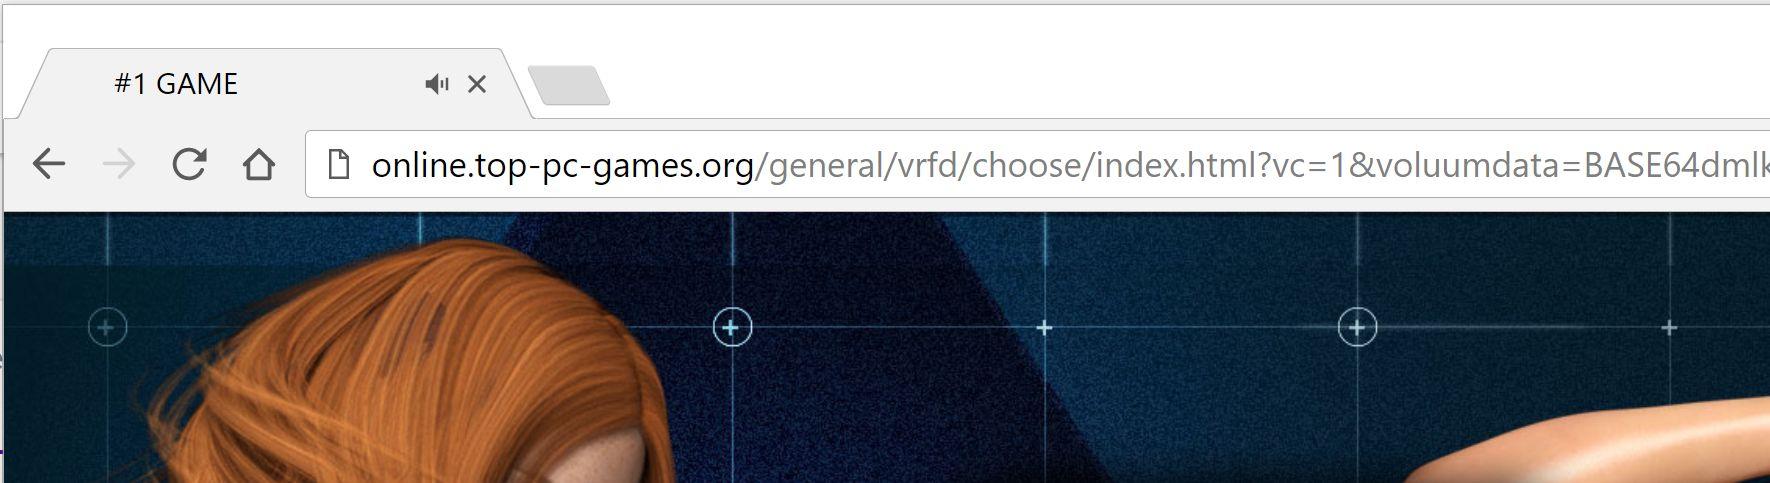 Online.top-pc-games.org redirect virus